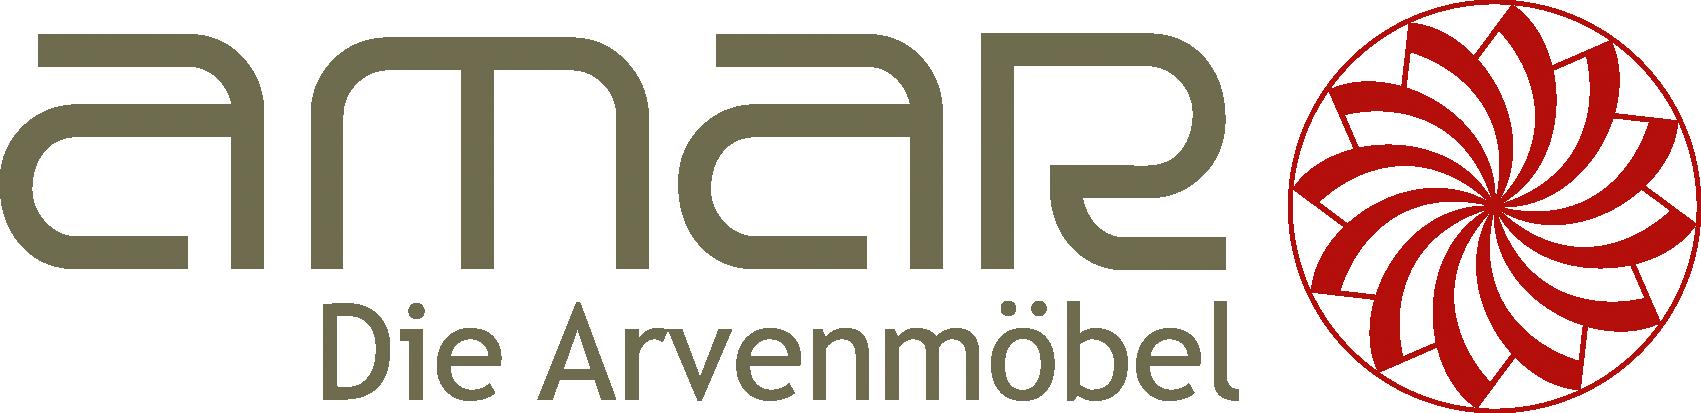 AMAR_ARVENMOEBEL_LOGO_transparent